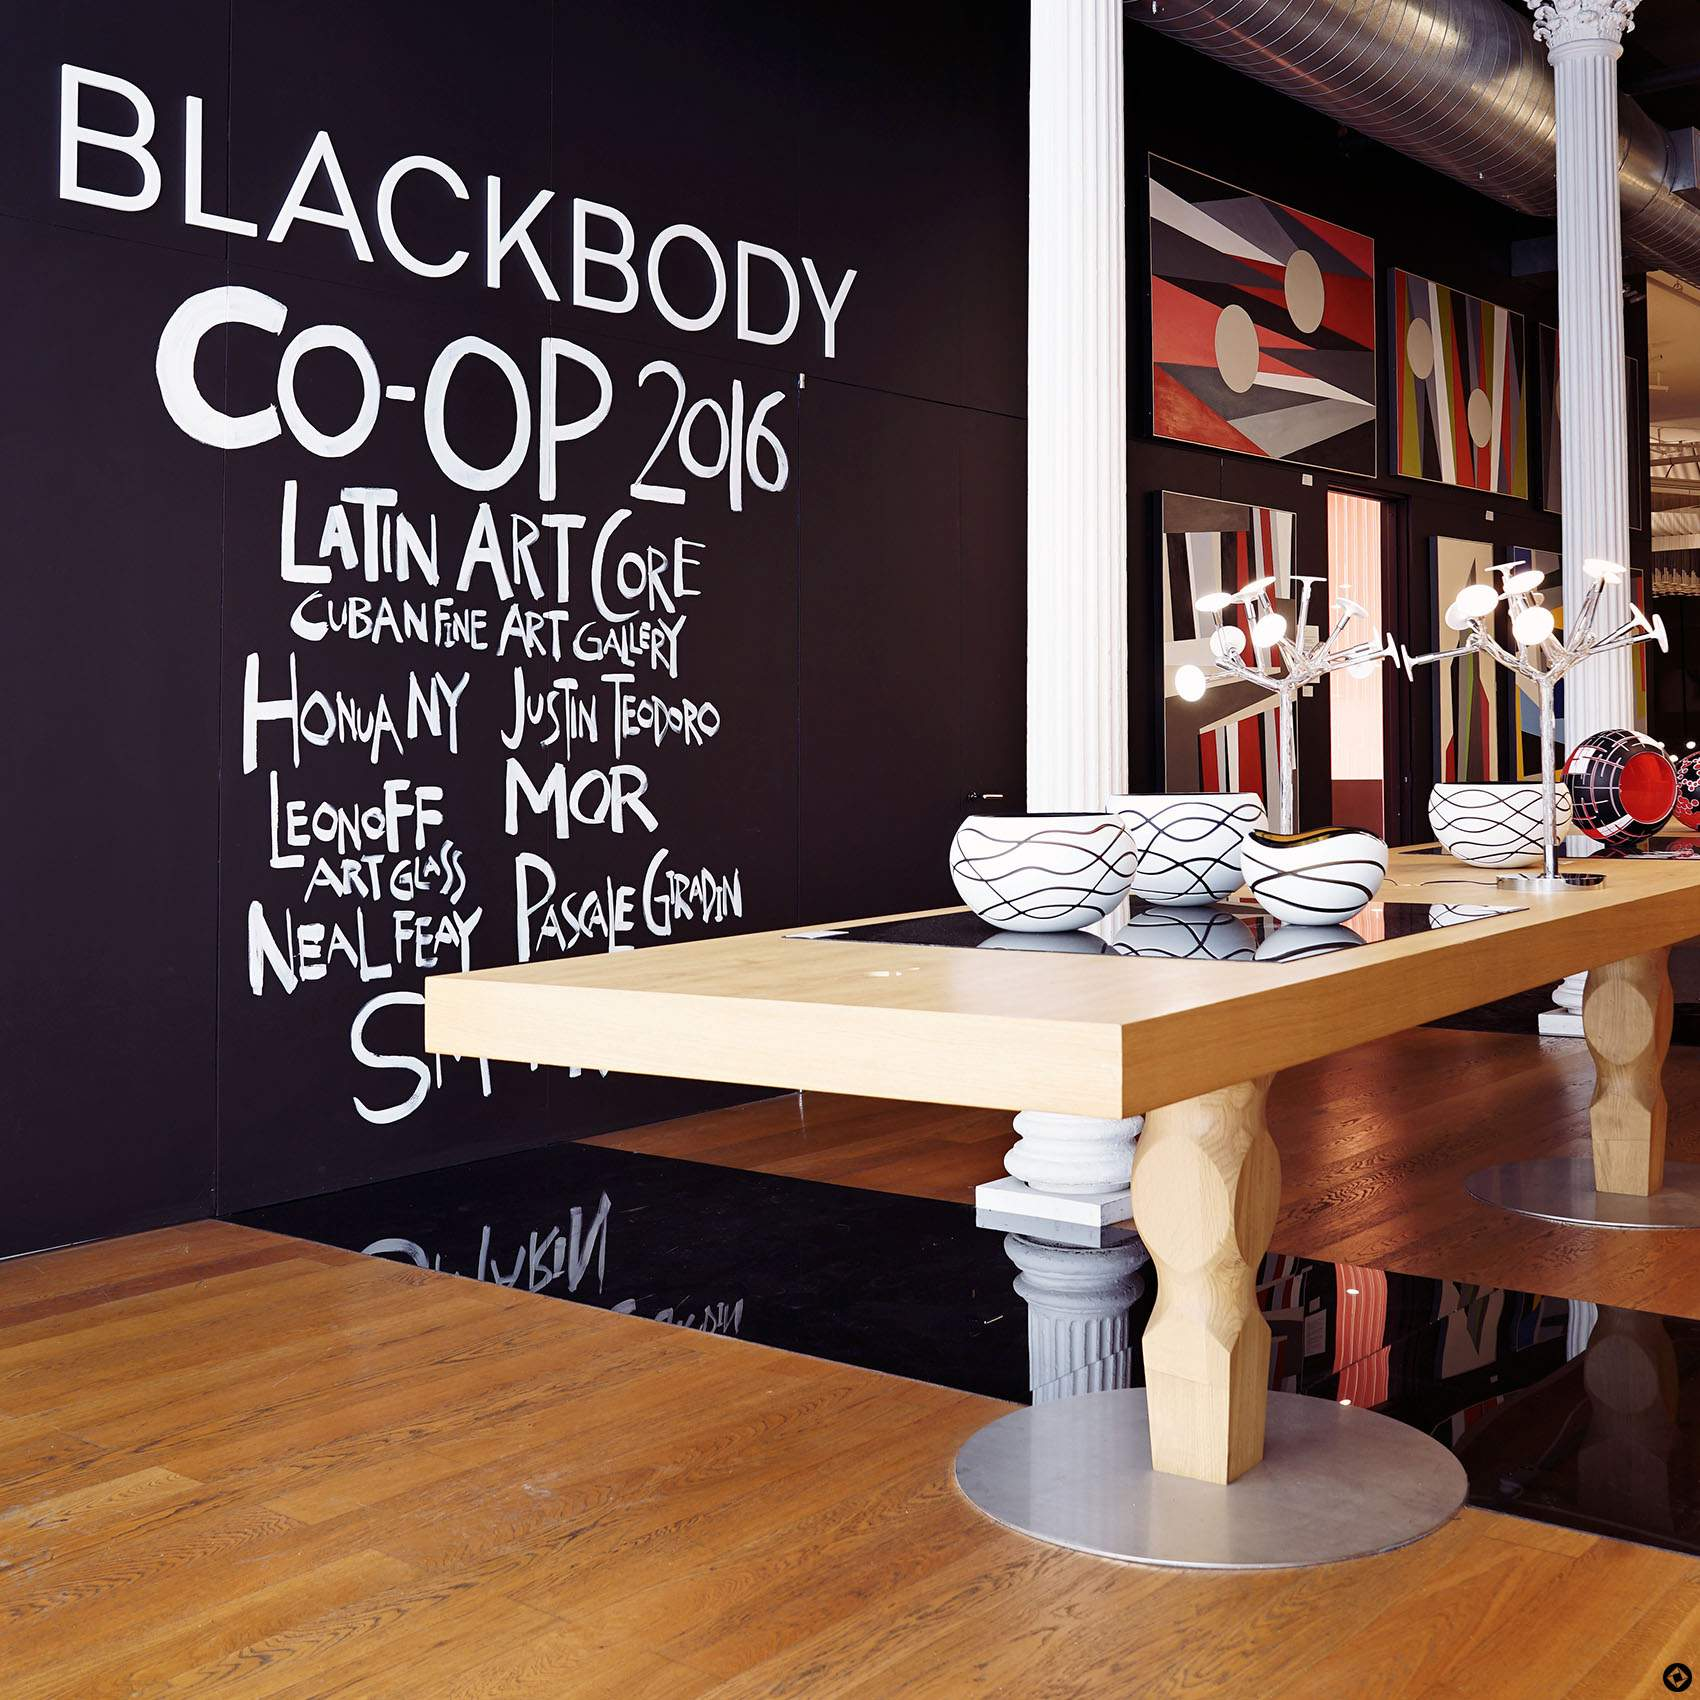 BLOG_BLACKBODY COOP 2016_4